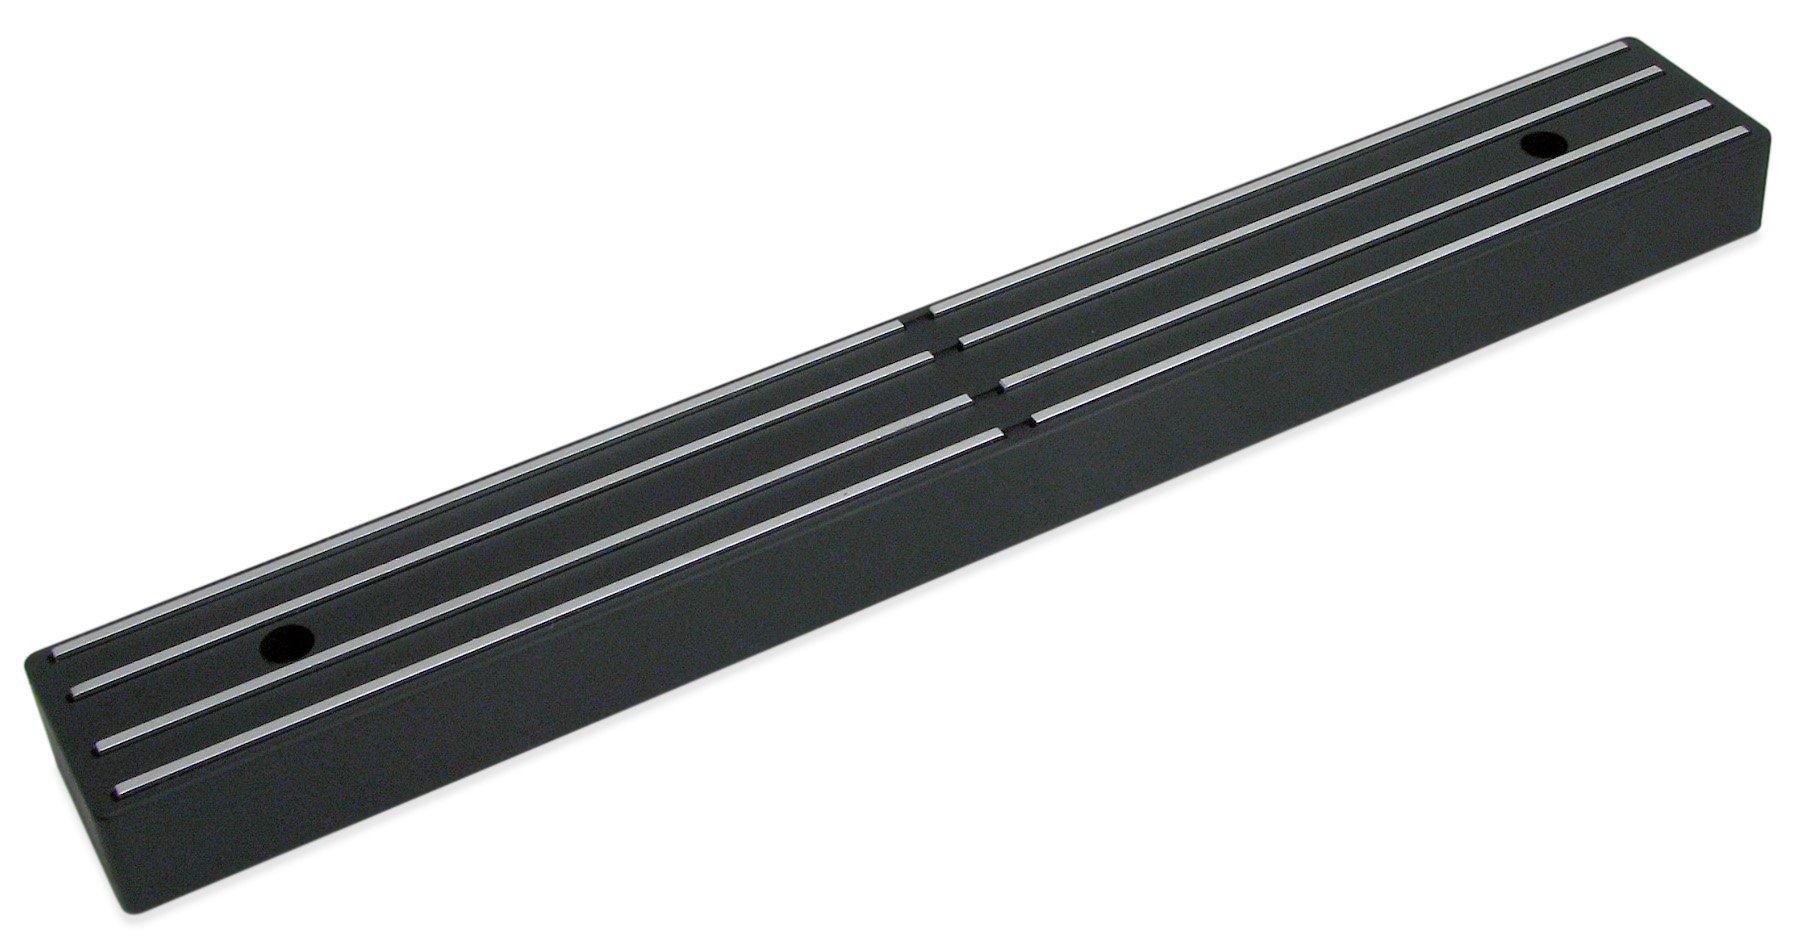 Master Magnetics Magnetic Tool Holder/Magnetic Knife Holder, 12-inch Double-Sided Magnet Strip, Mount on Metal Surface (Black) 07577 by Master Magnetics